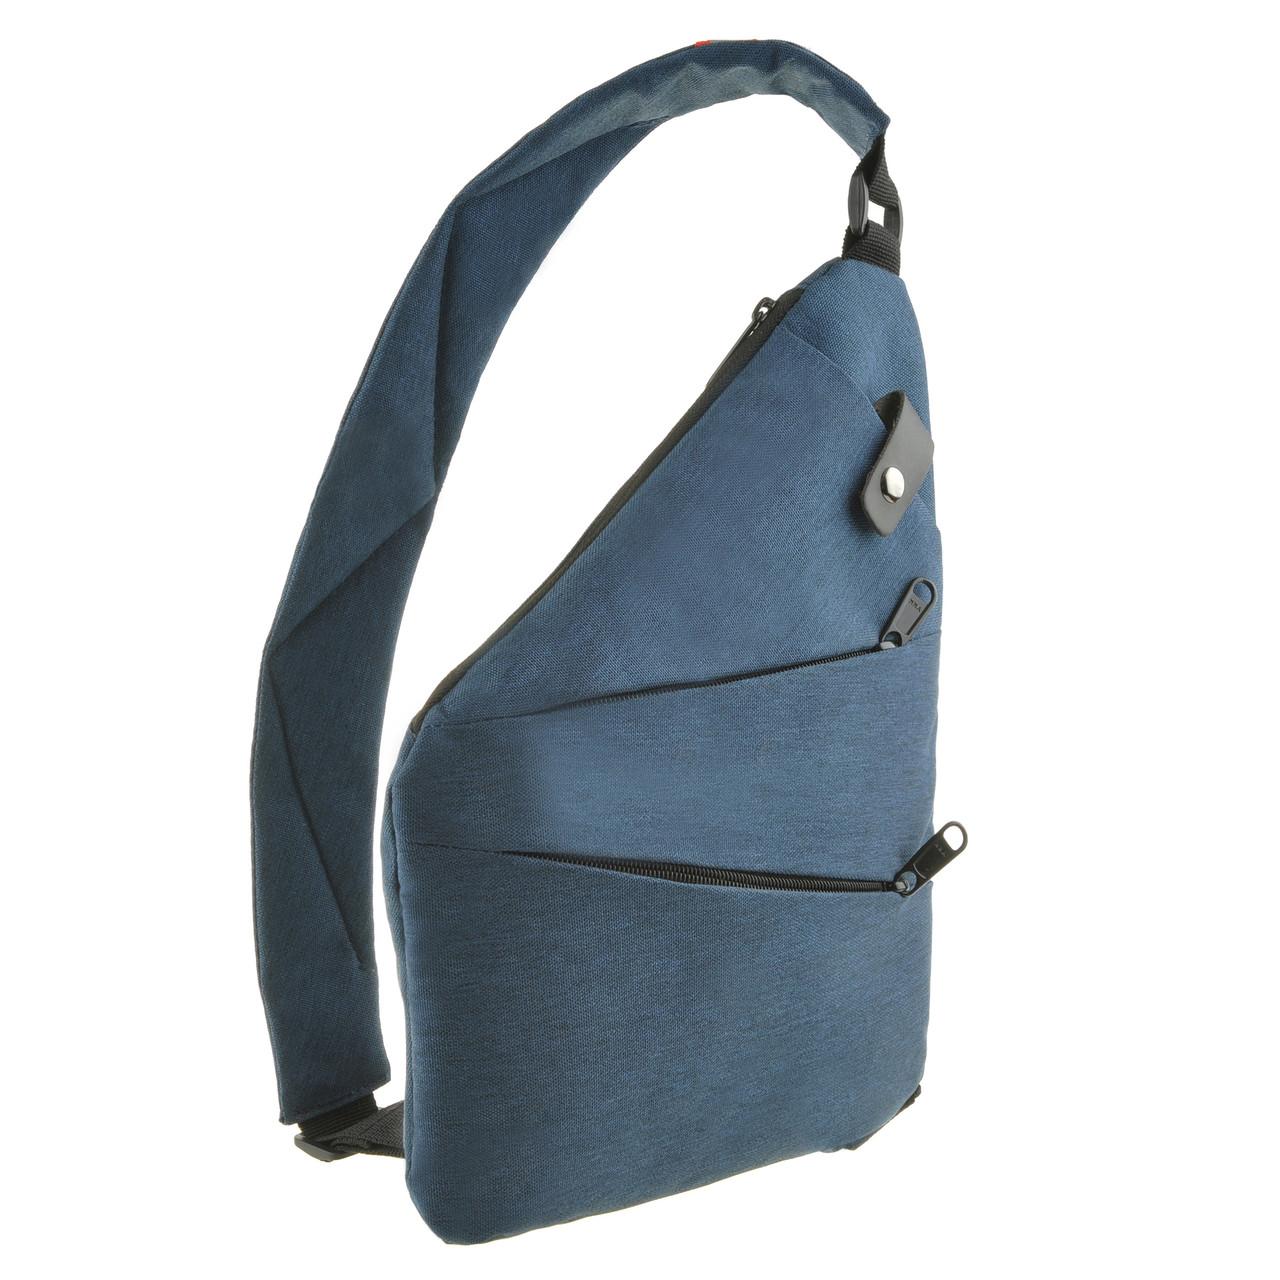 Рюкзак BagHouse городской одналямка  23х31х5 синий полиестер  ксНЛ1692син